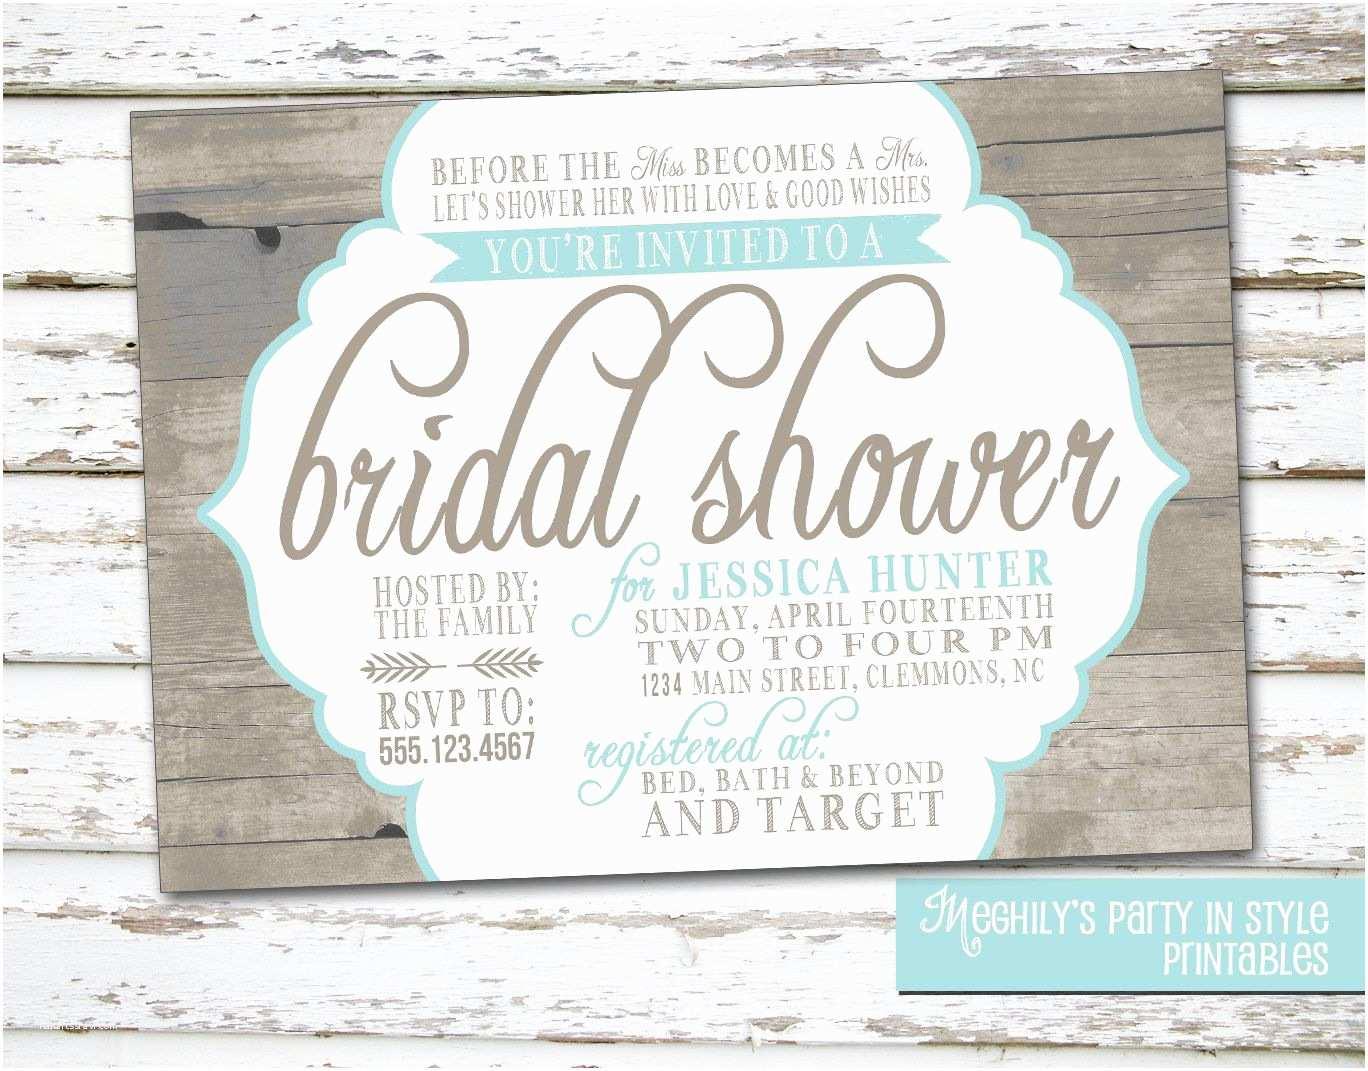 Inexpensive Bridal Shower Invitations Cheap Wedding Shower Invitations Cheap Bridal Shower